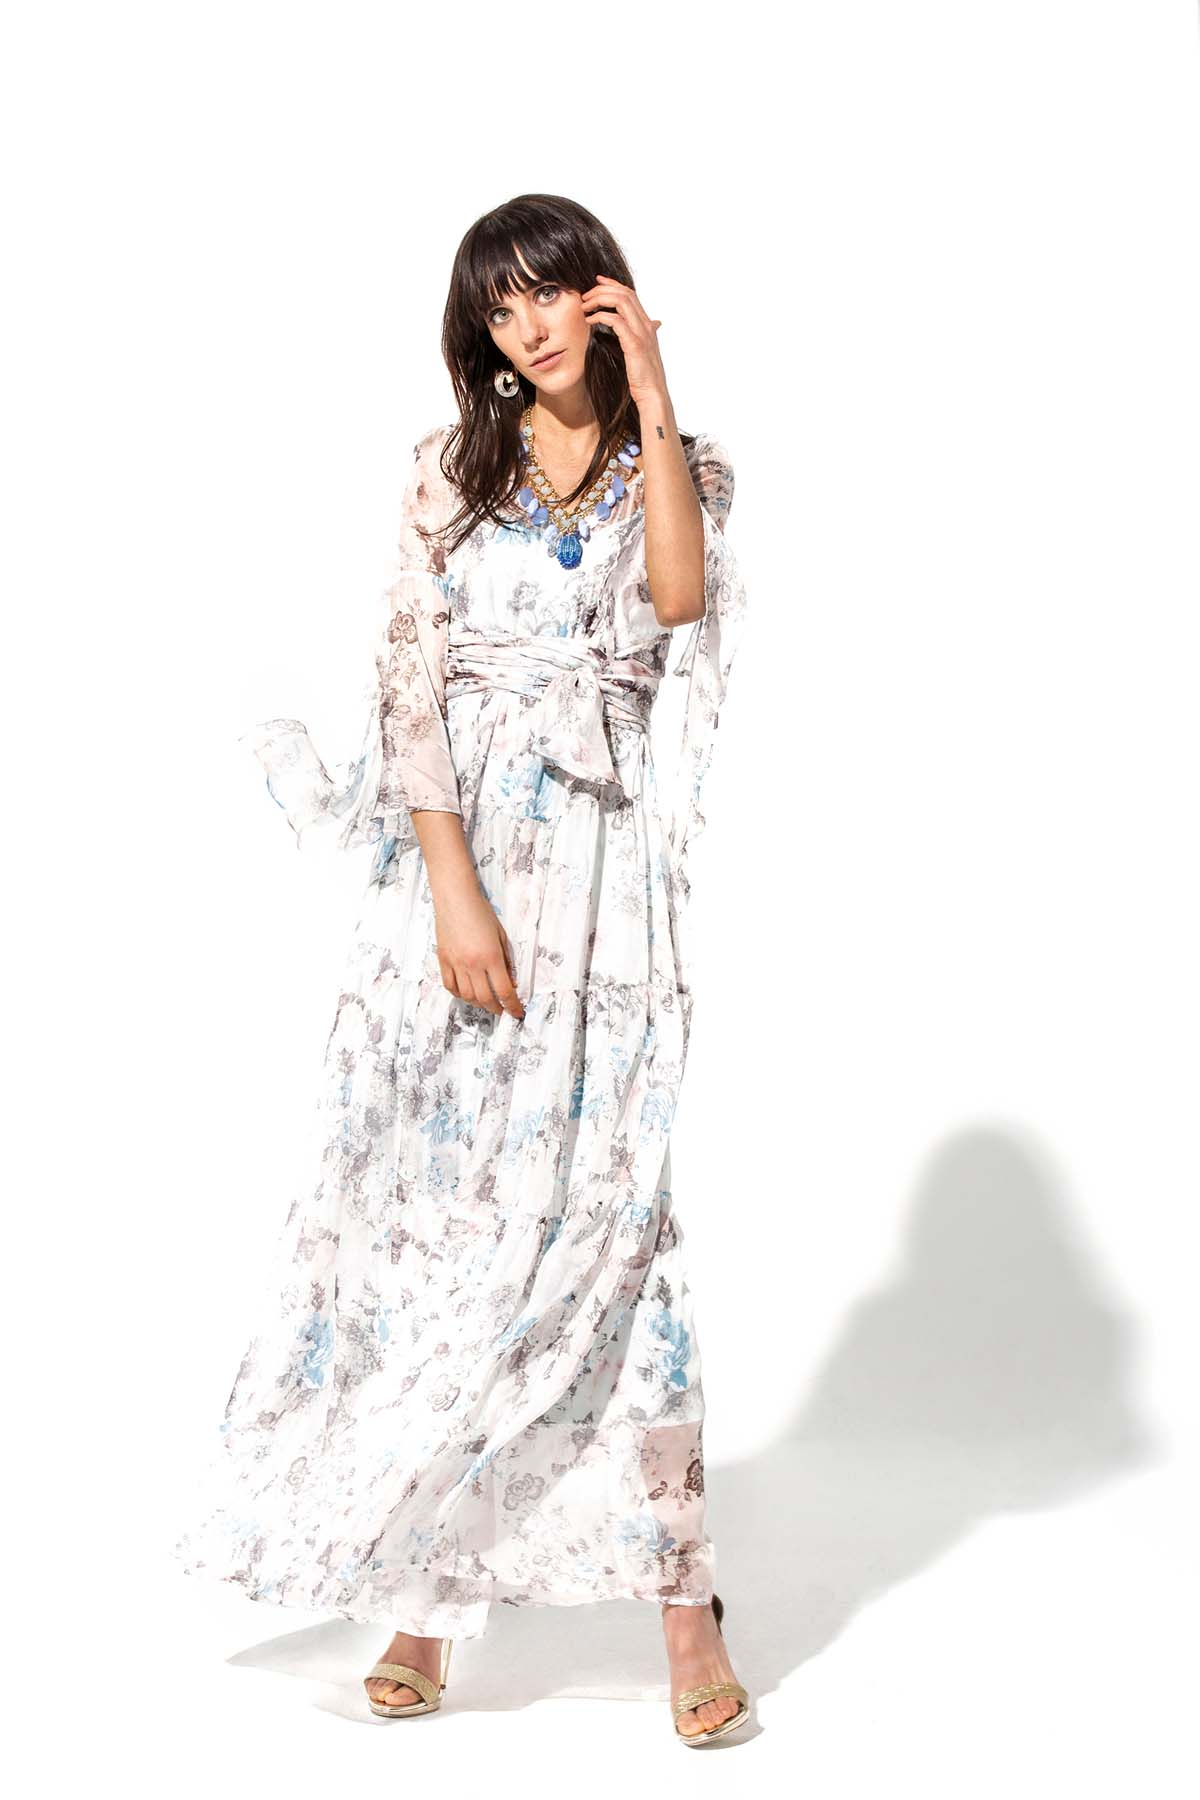 Teria Yabar - Vestido largo romántico